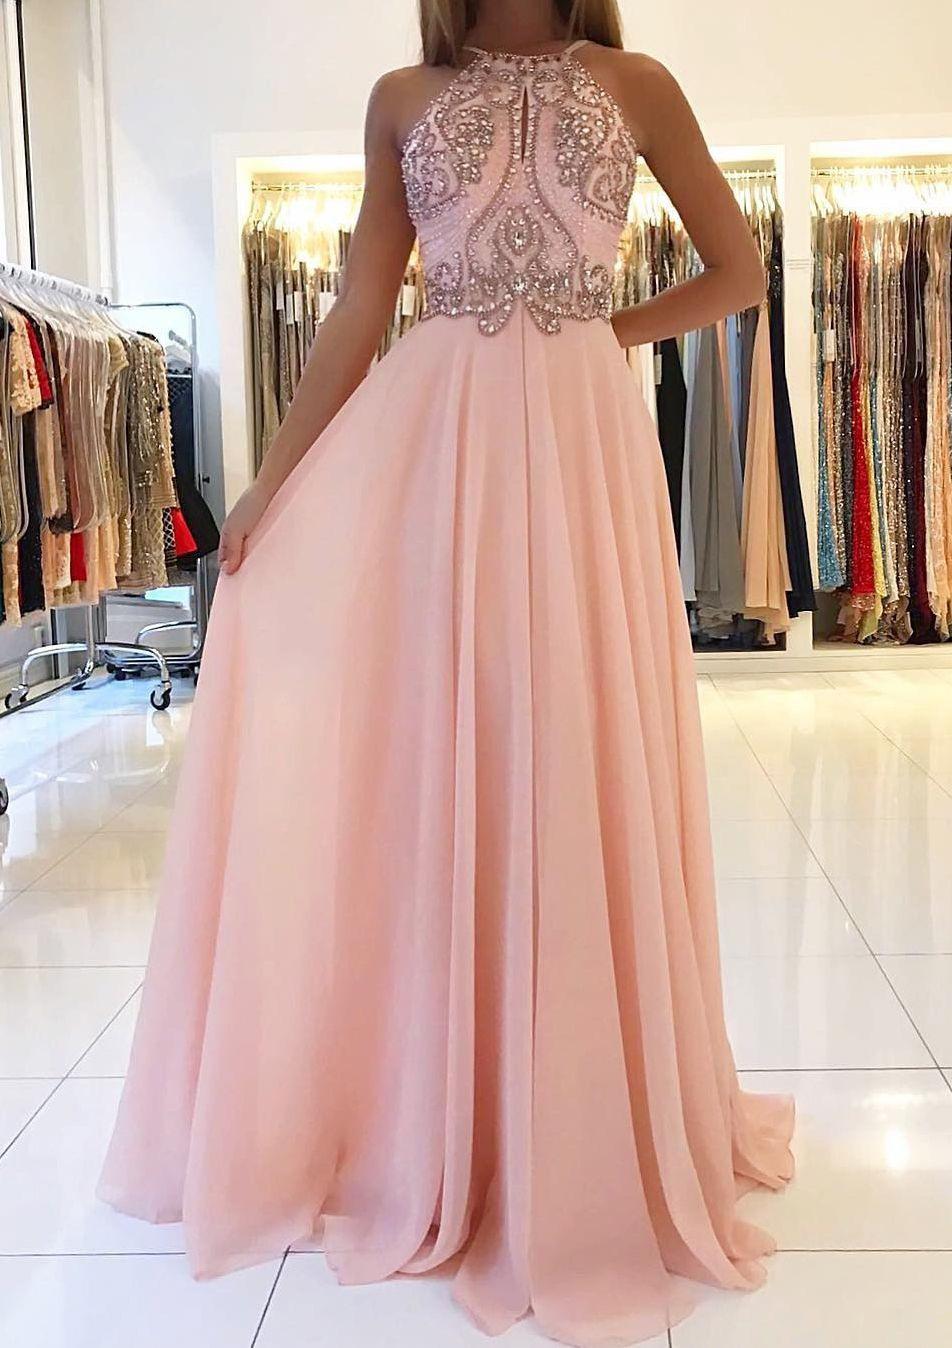 13 Top Rosa Abend Kleid DesignAbend Cool Rosa Abend Kleid Design